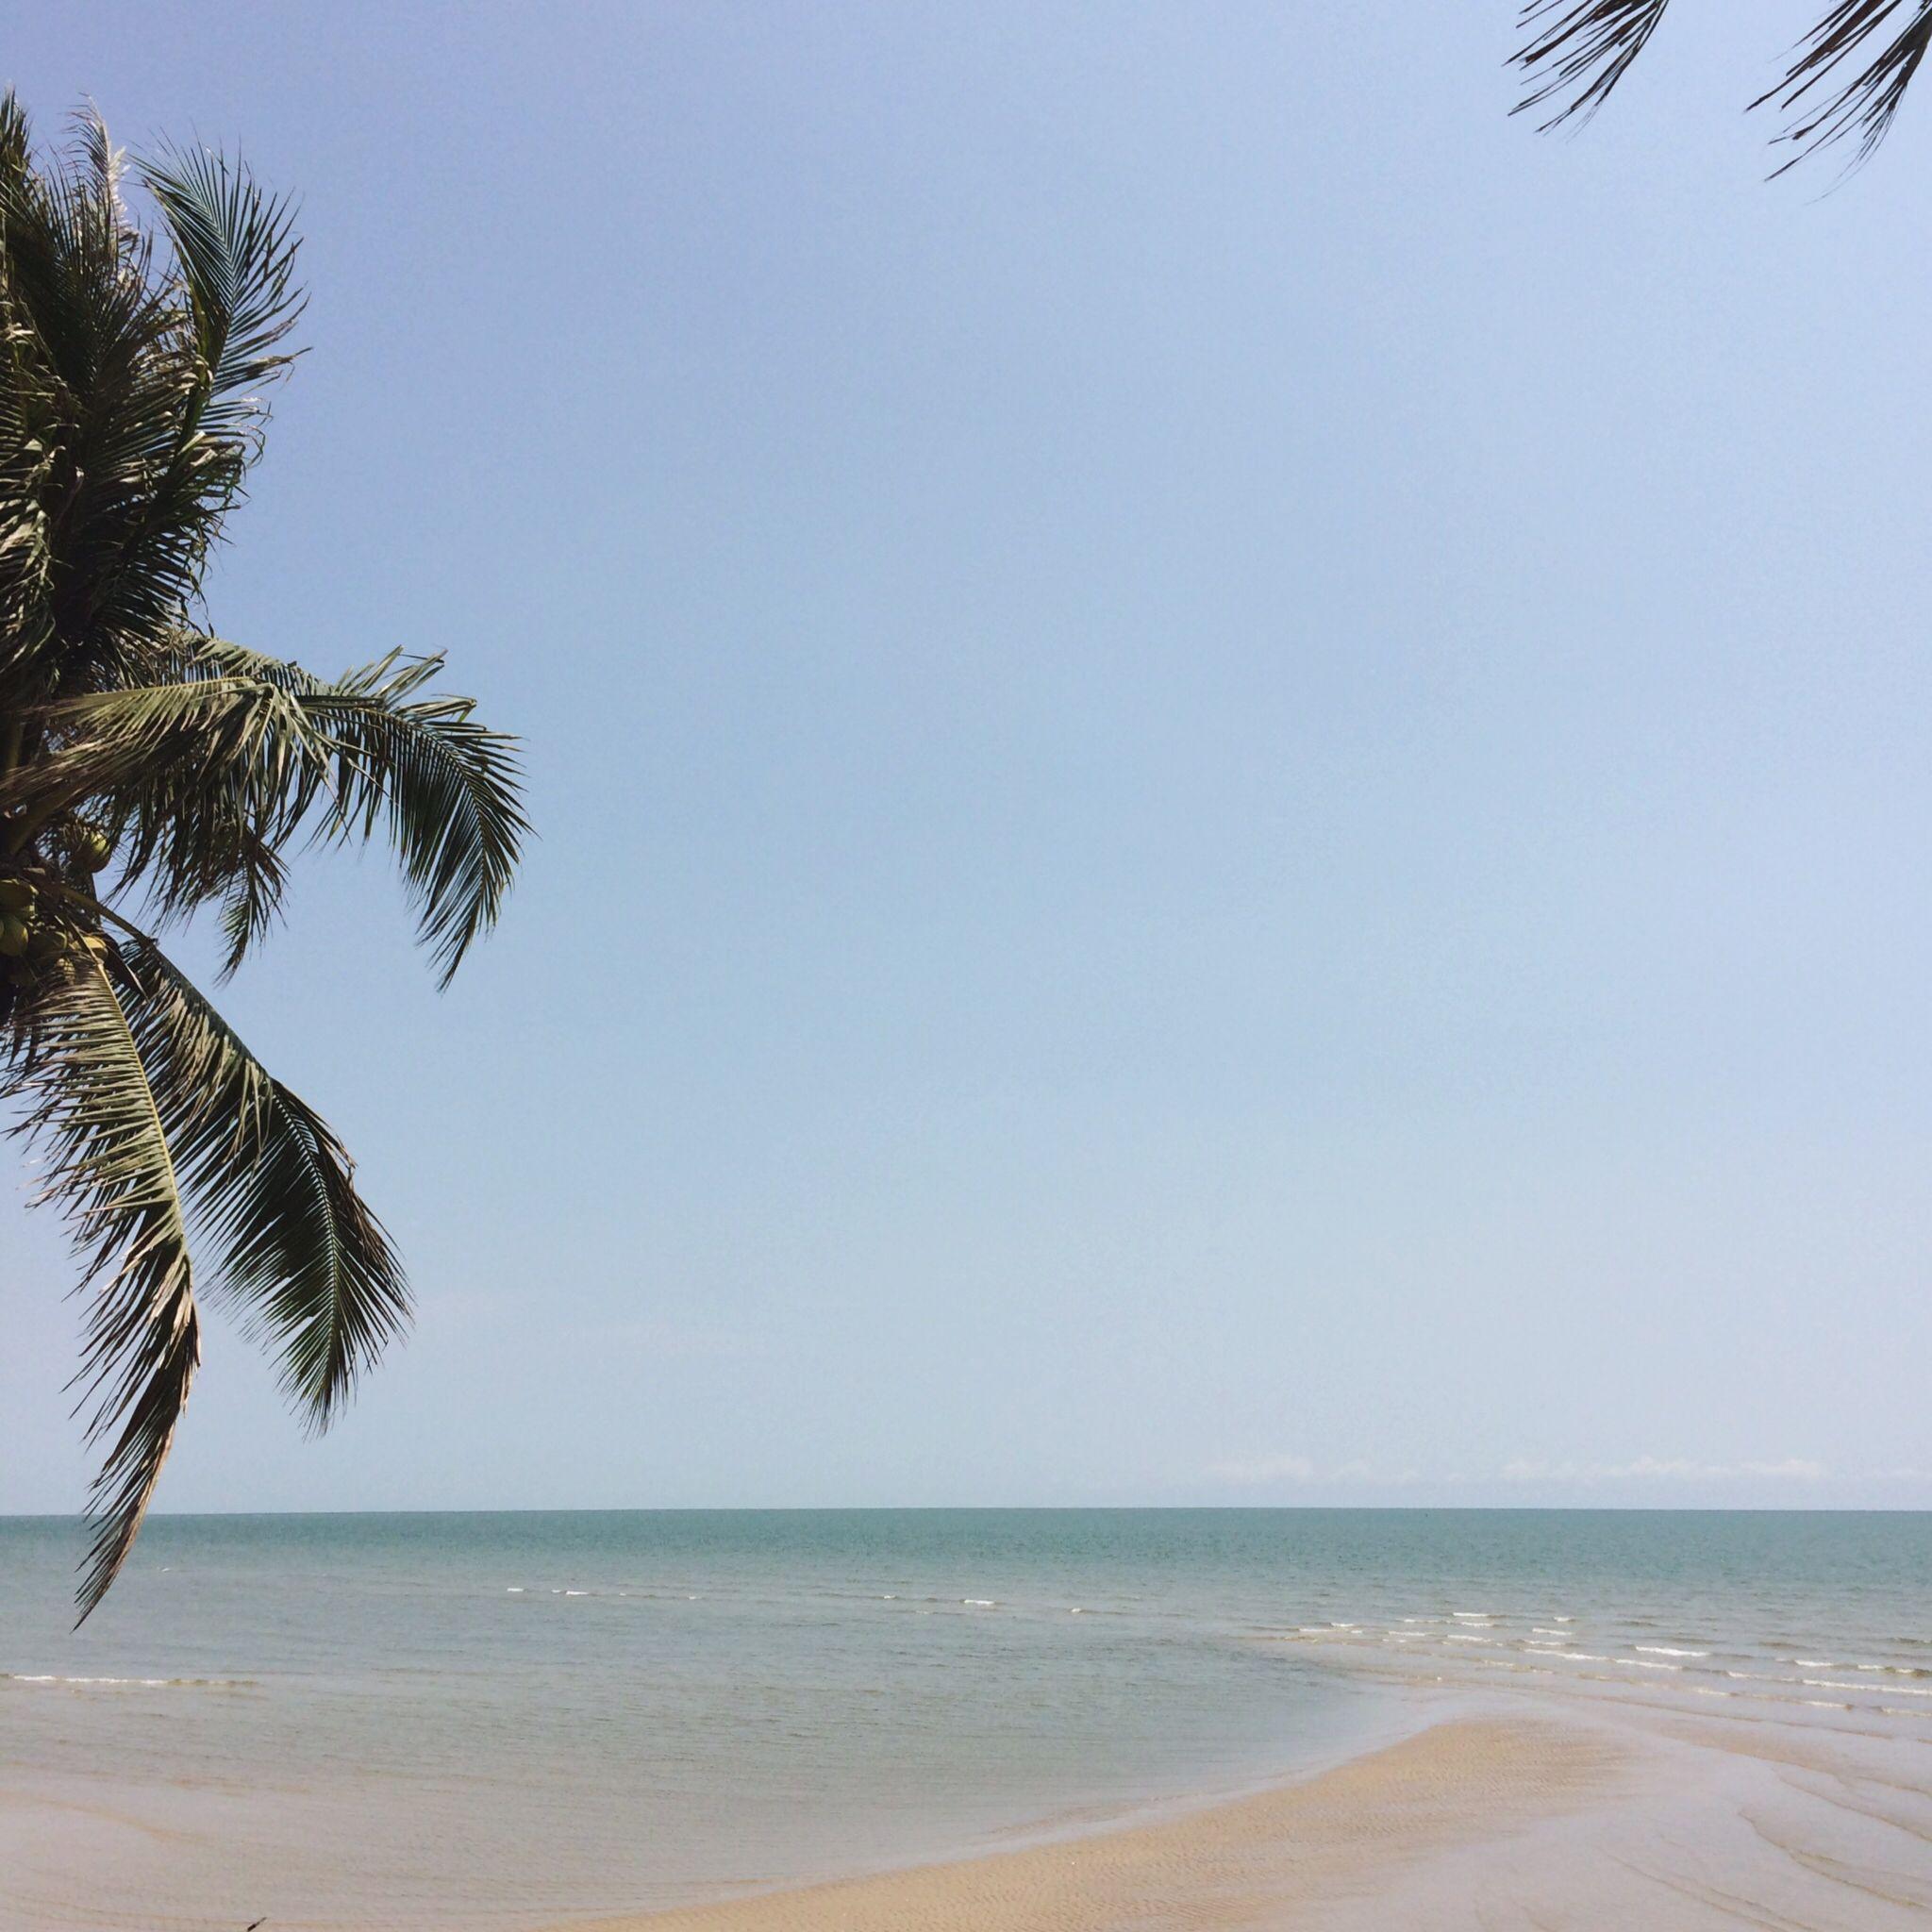 Deserted Island Beach: Desert Island, Beach Shoot